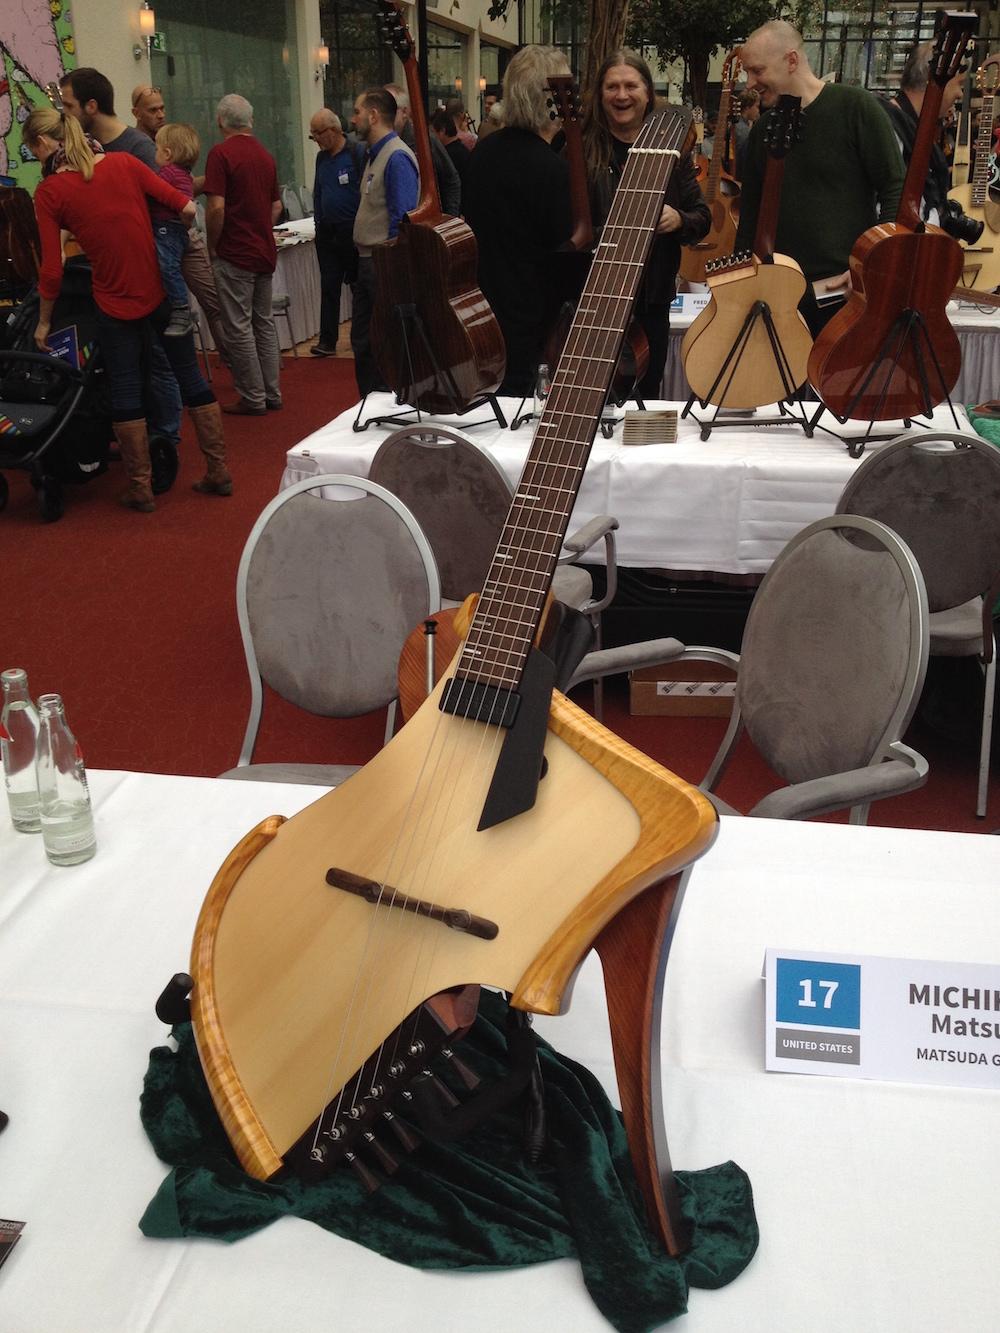 Michihiro Matsuda guitar at the 2014 Holy Grail Guitar Show